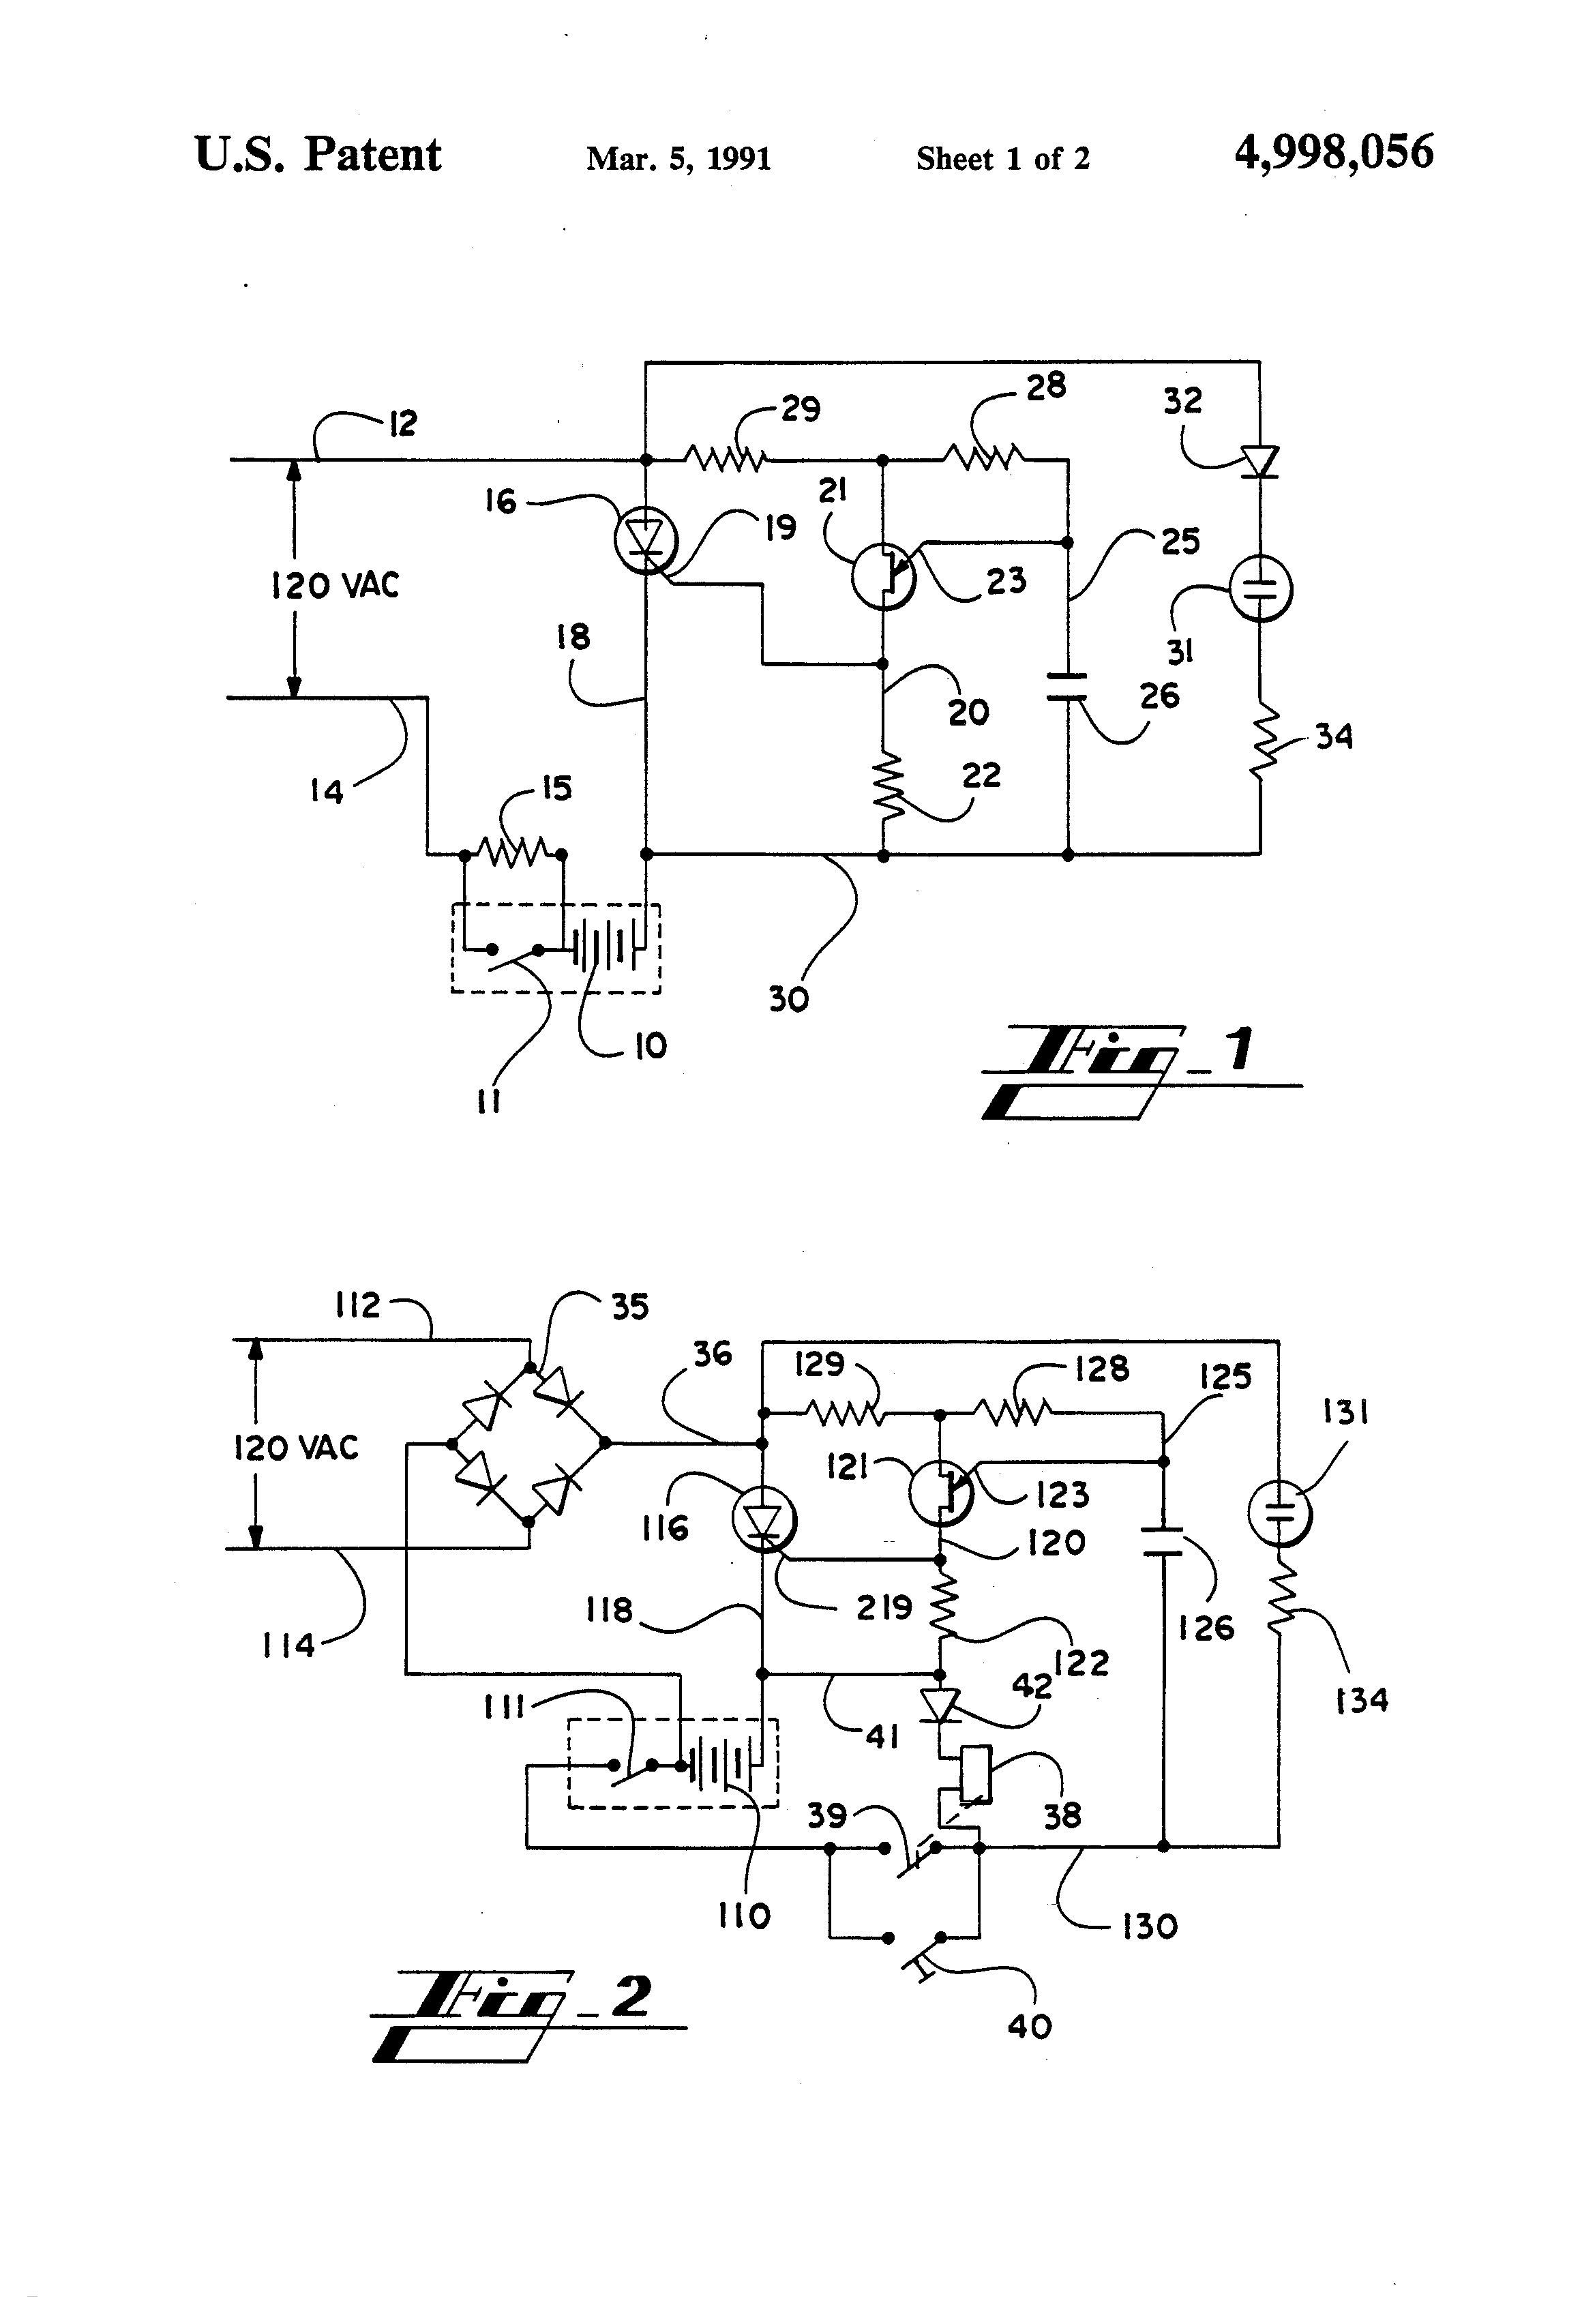 car battery charger circuit diagram schumacher battery charger schumacher  battery charger parts diagram car battery charger